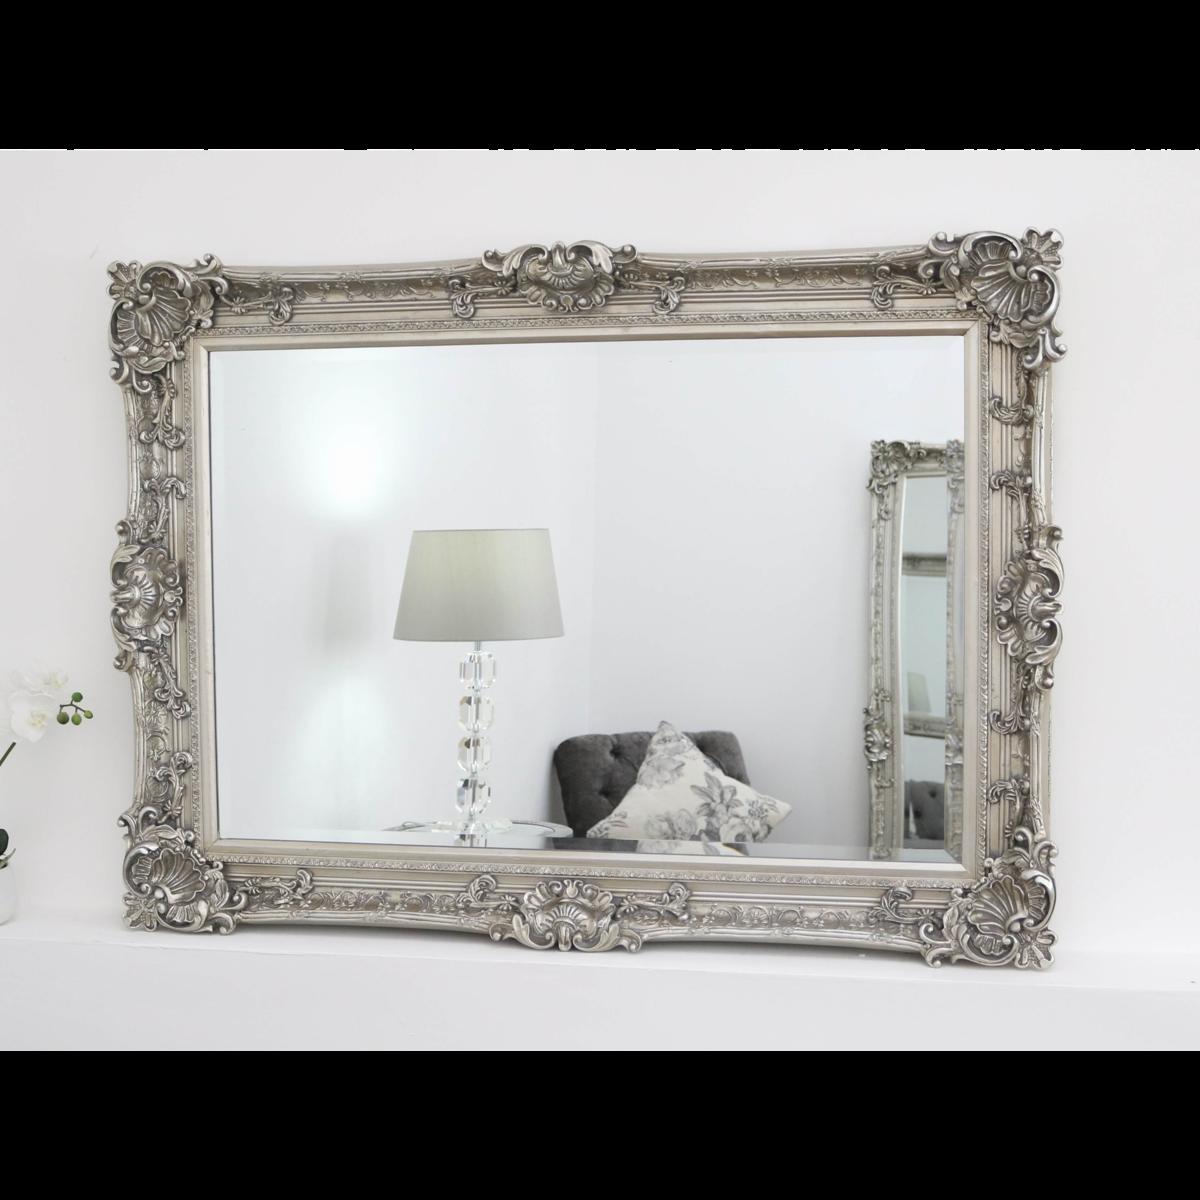 Hampshire Silver Ornate Rectangular Mirror 44 X 32 112cm X 81cm White Ornate Mirror Ornate Mirror White Mirror Frame